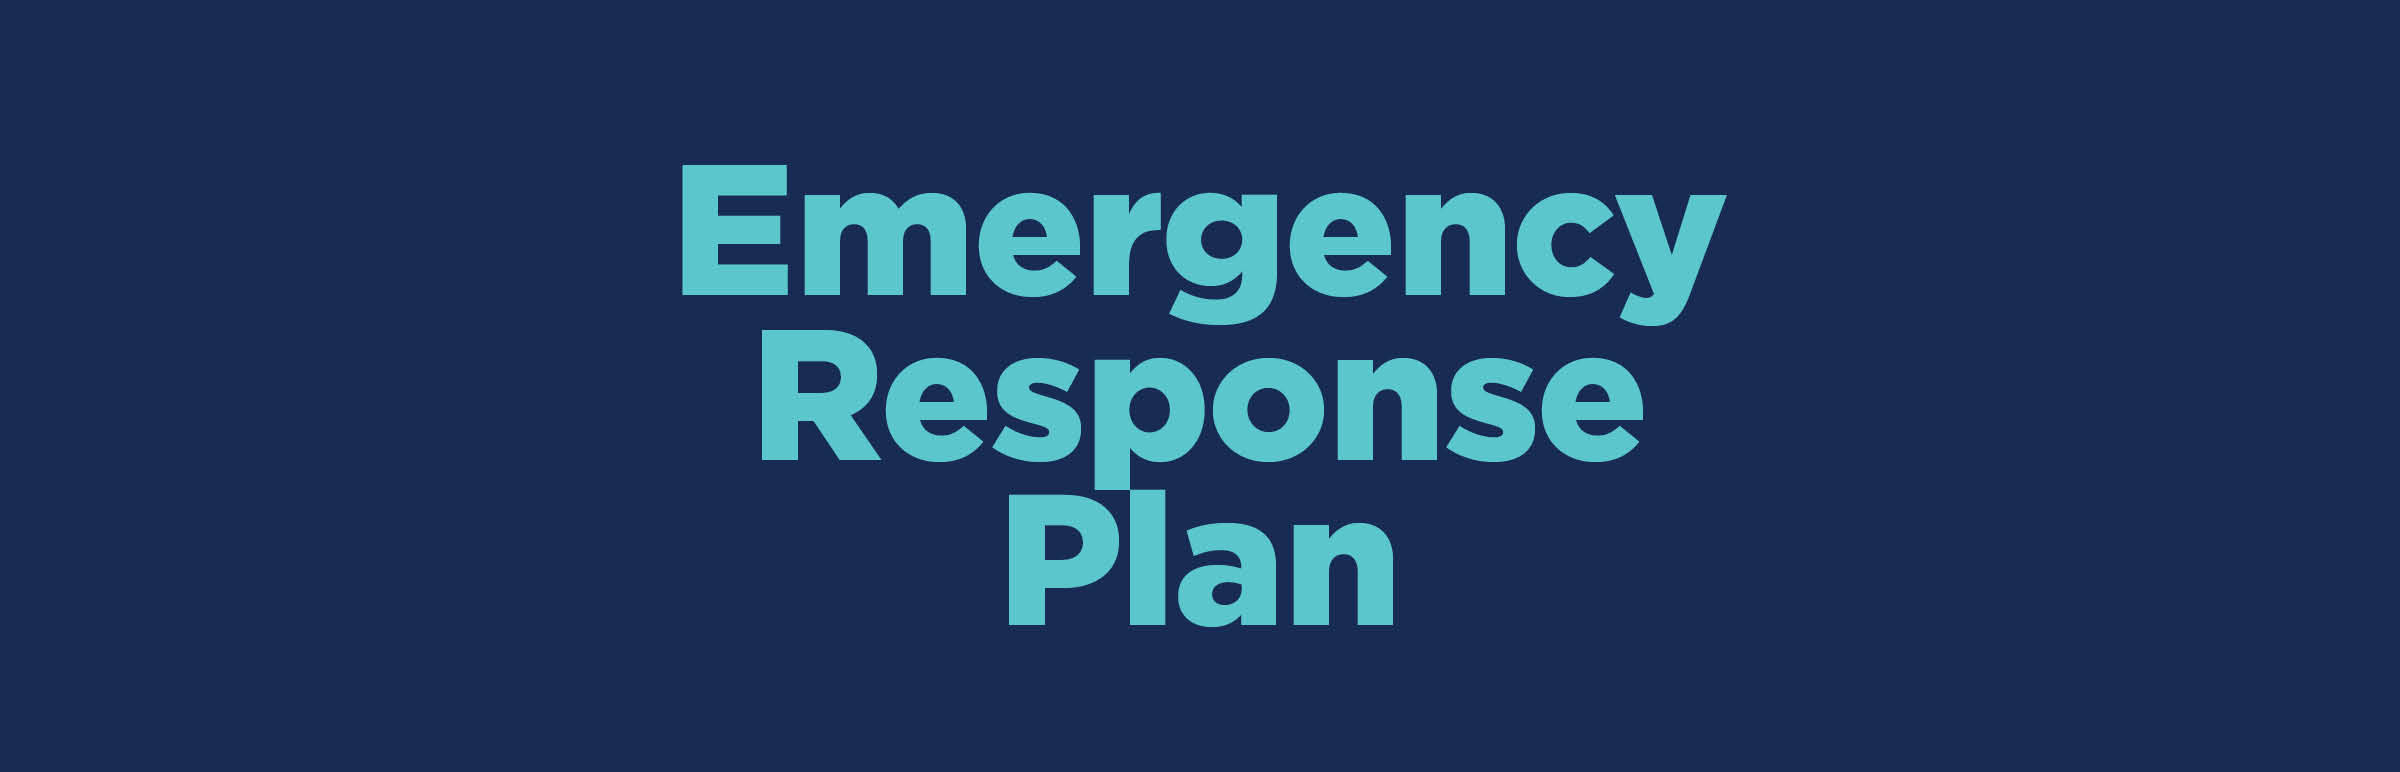 PGV-036-Emergency-Response-Web-Image-FP